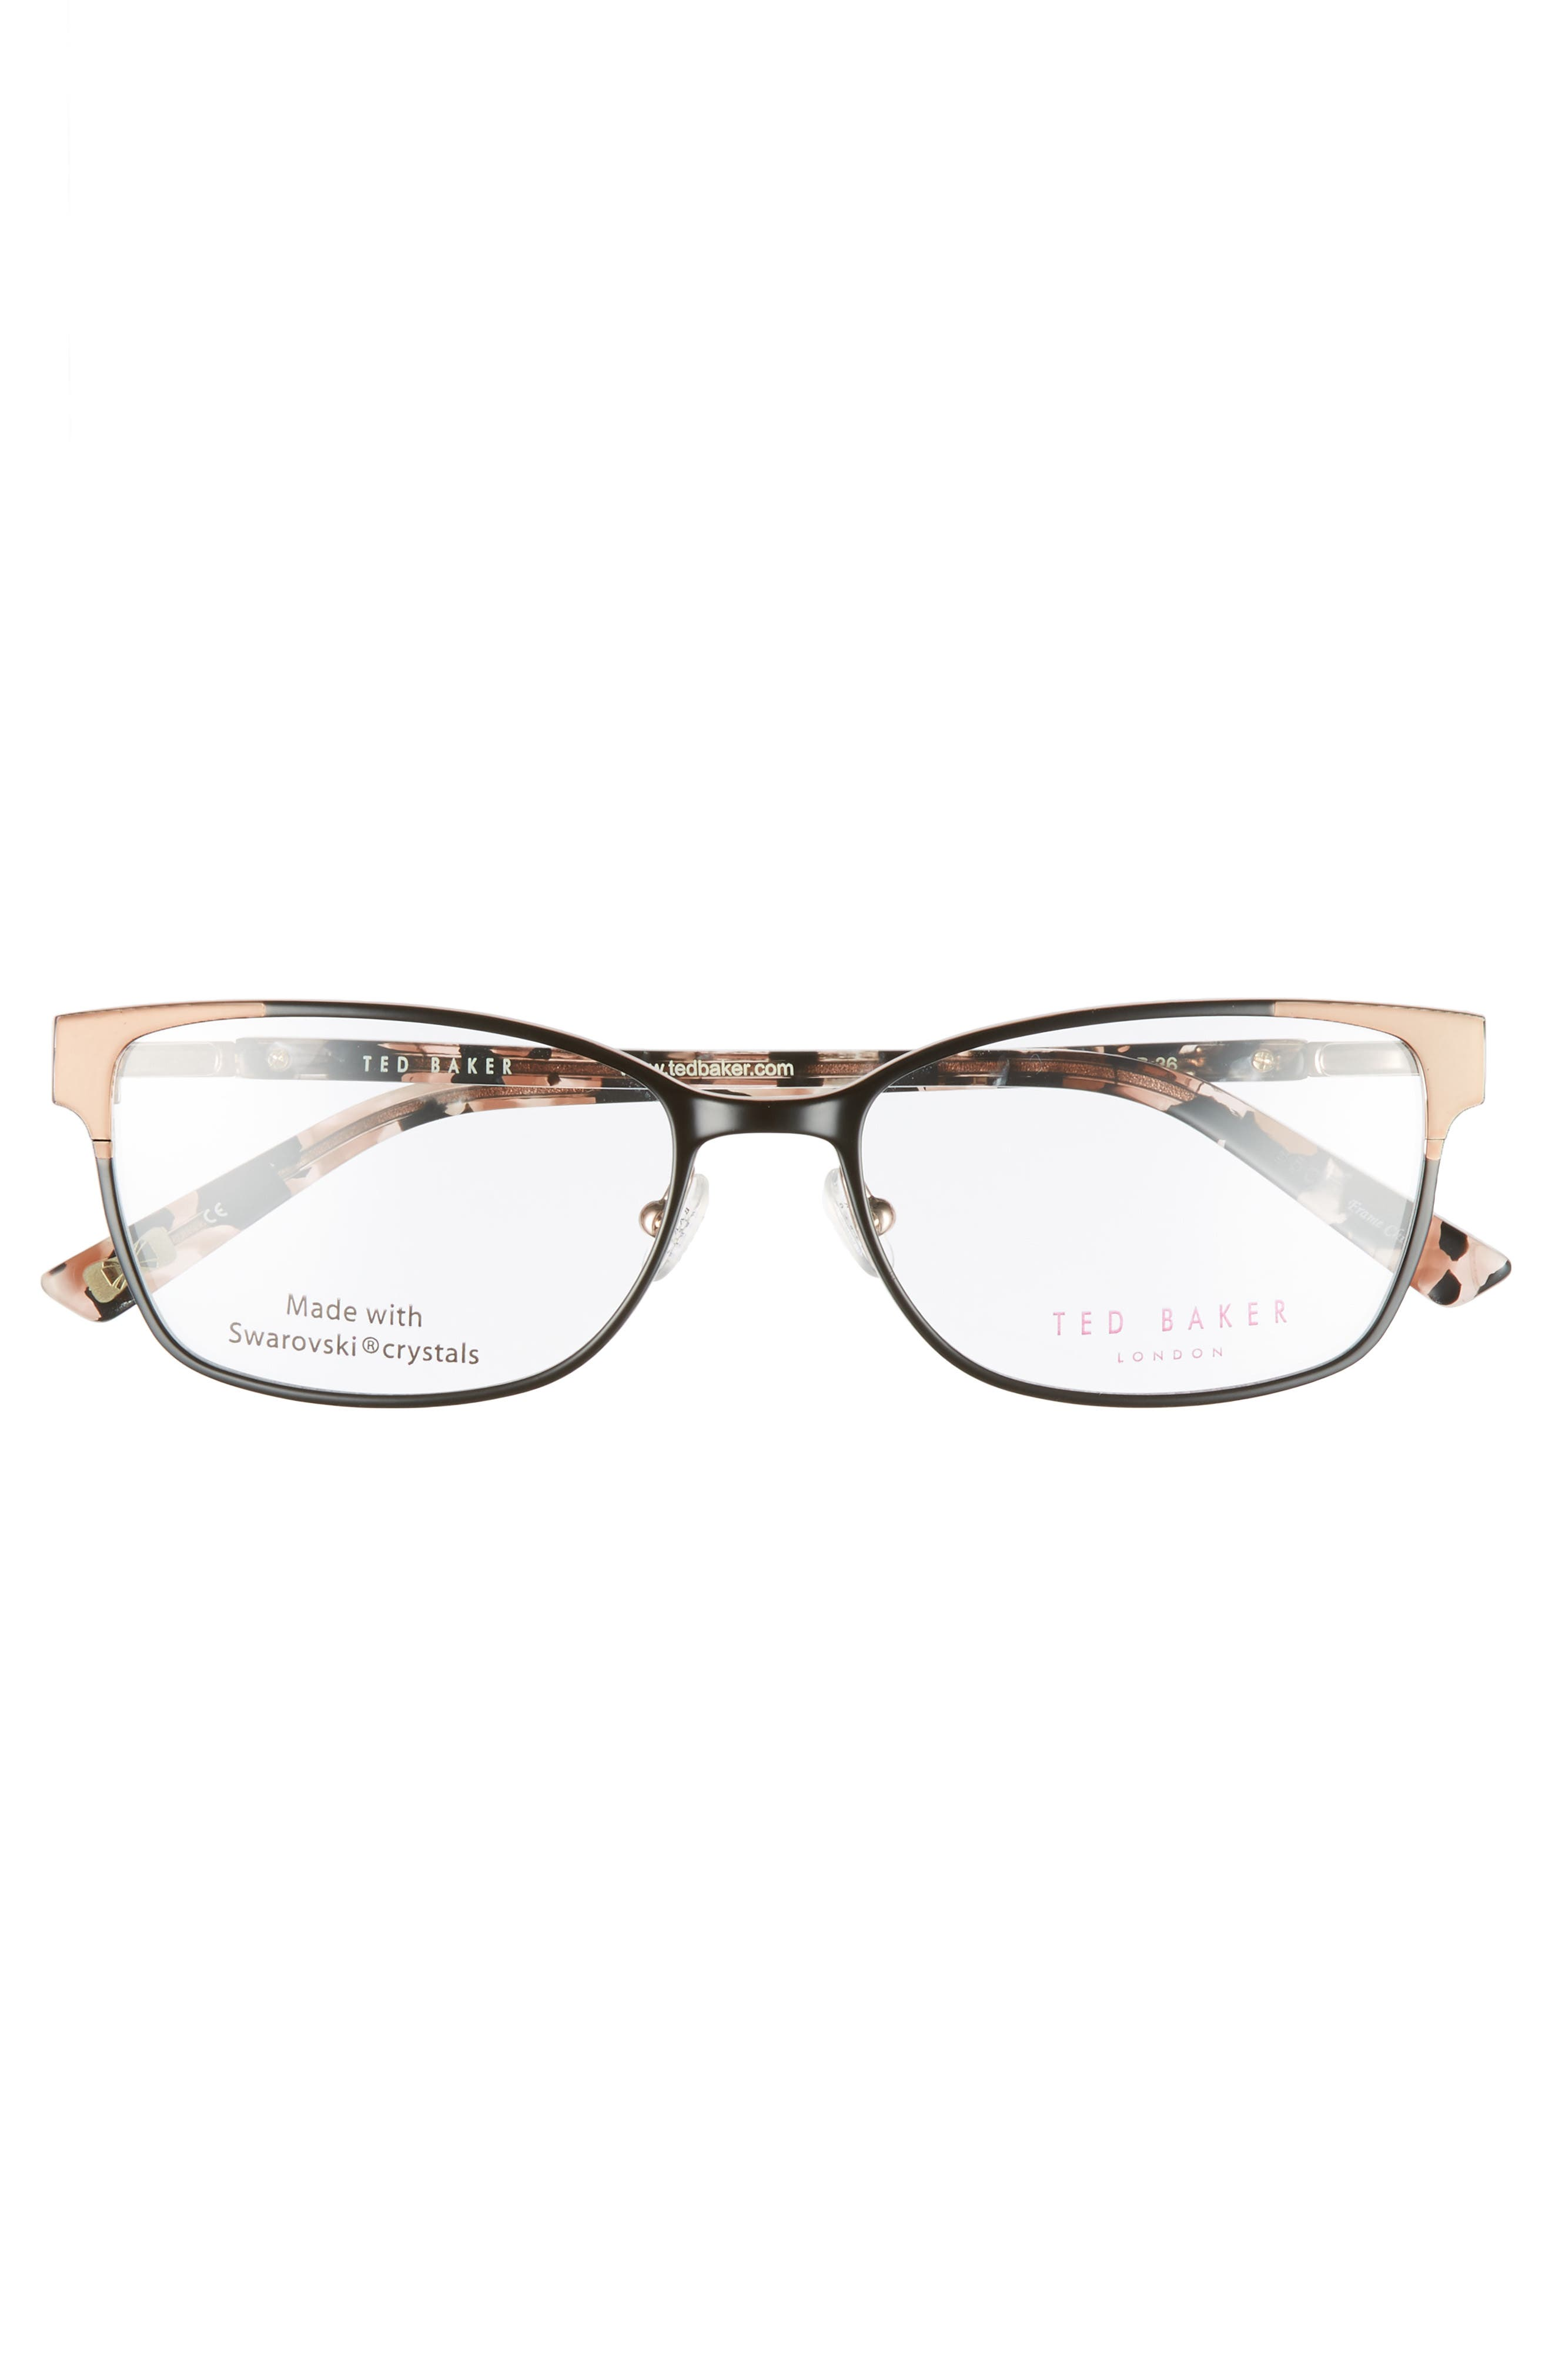 52mm Crystal Rectangular Optical Glasses,                             Alternate thumbnail 3, color,                             001